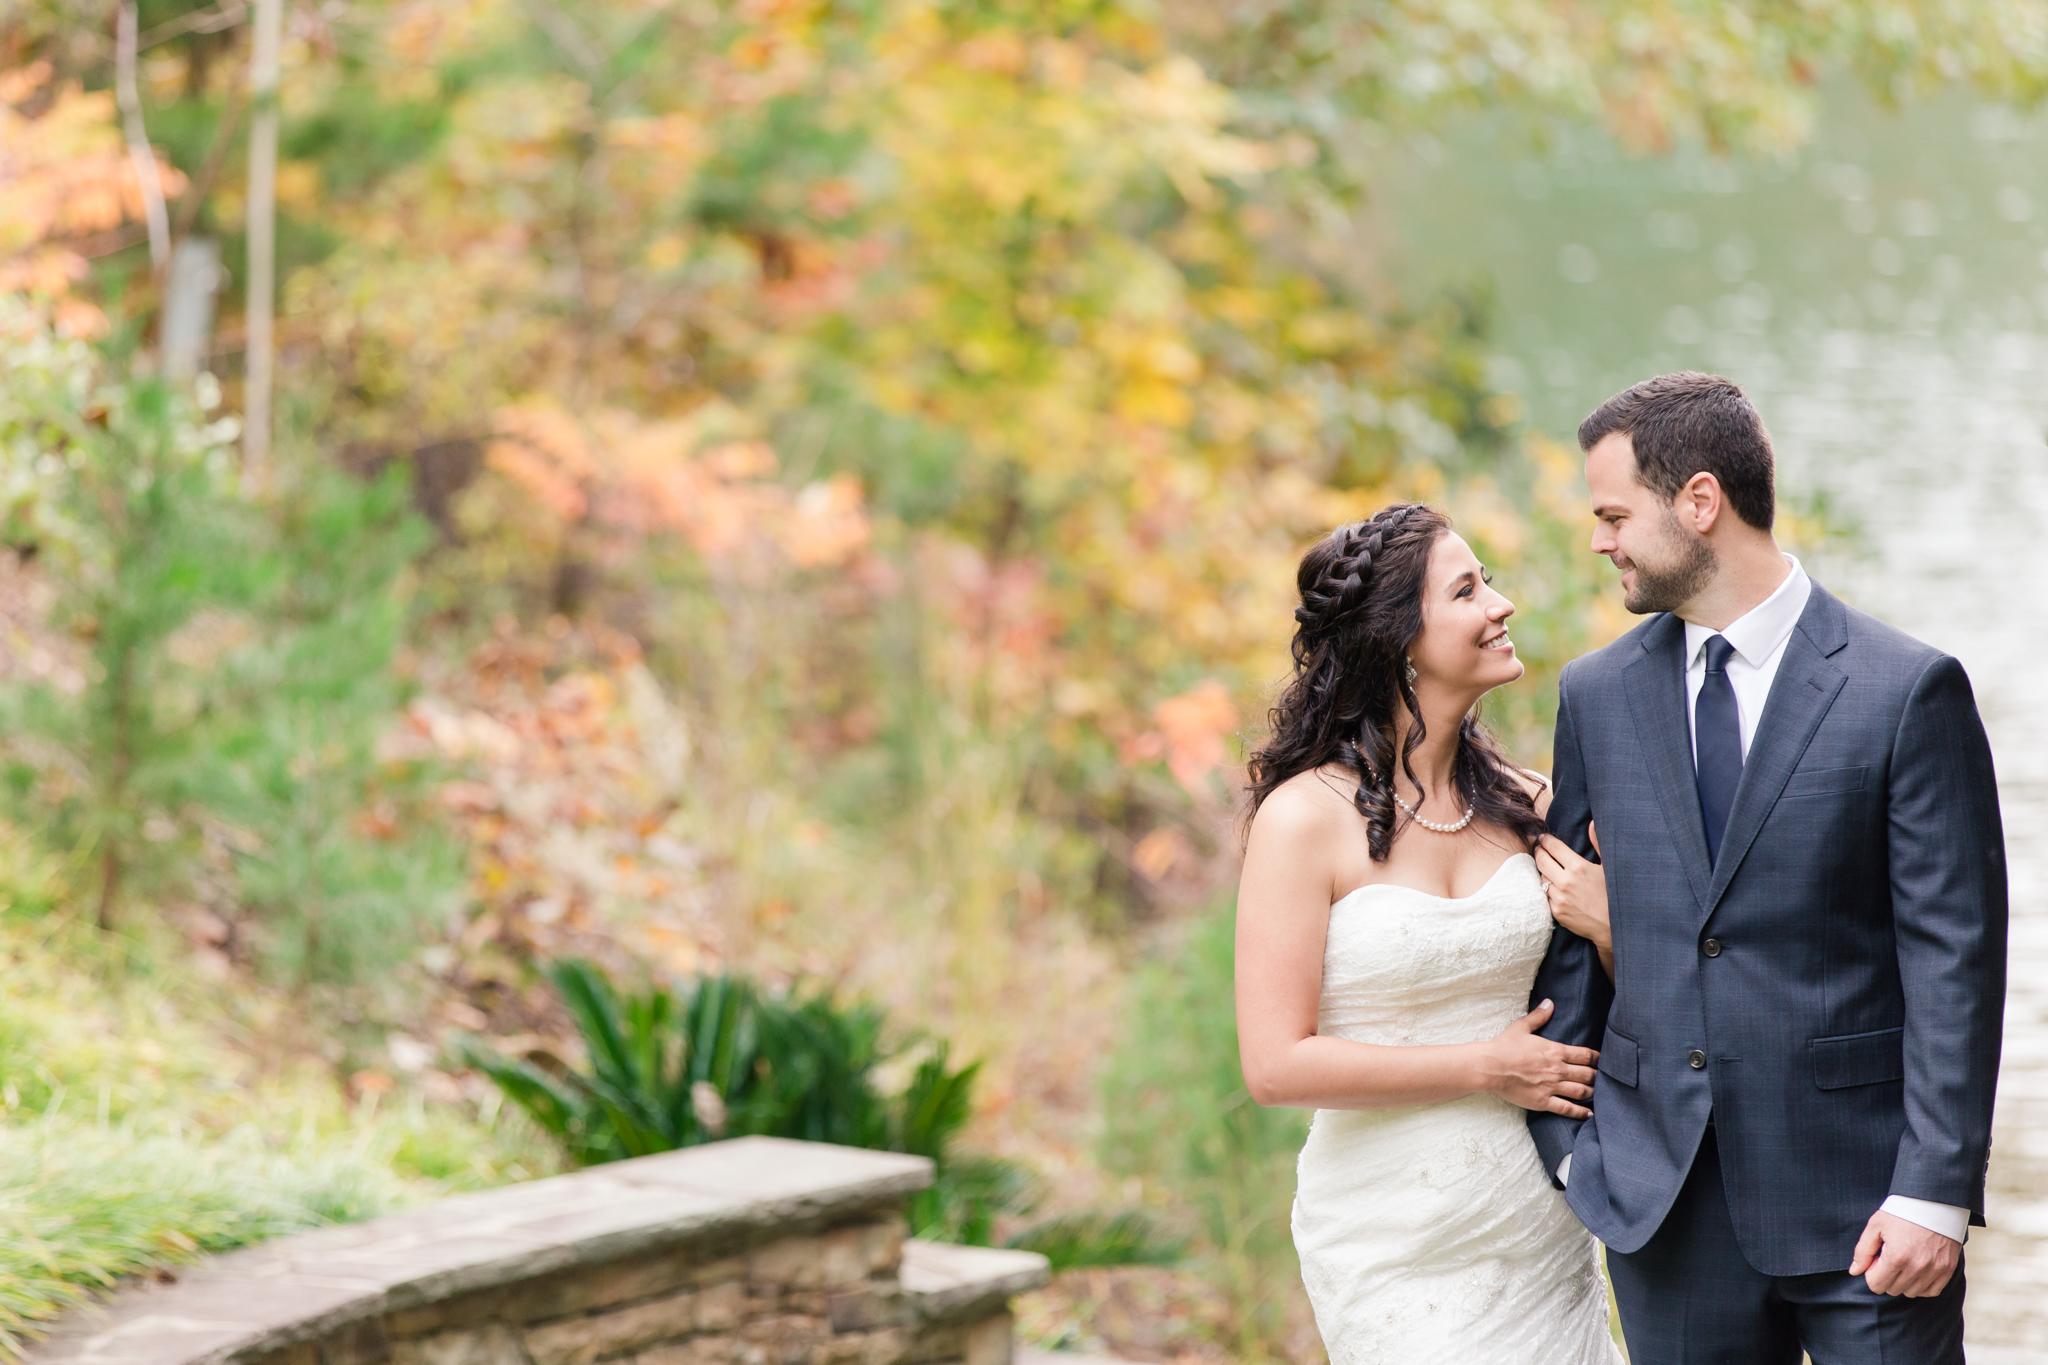 Ashley-Amber-Photo-Outdoor-Wedding-Photography-154718.jpg